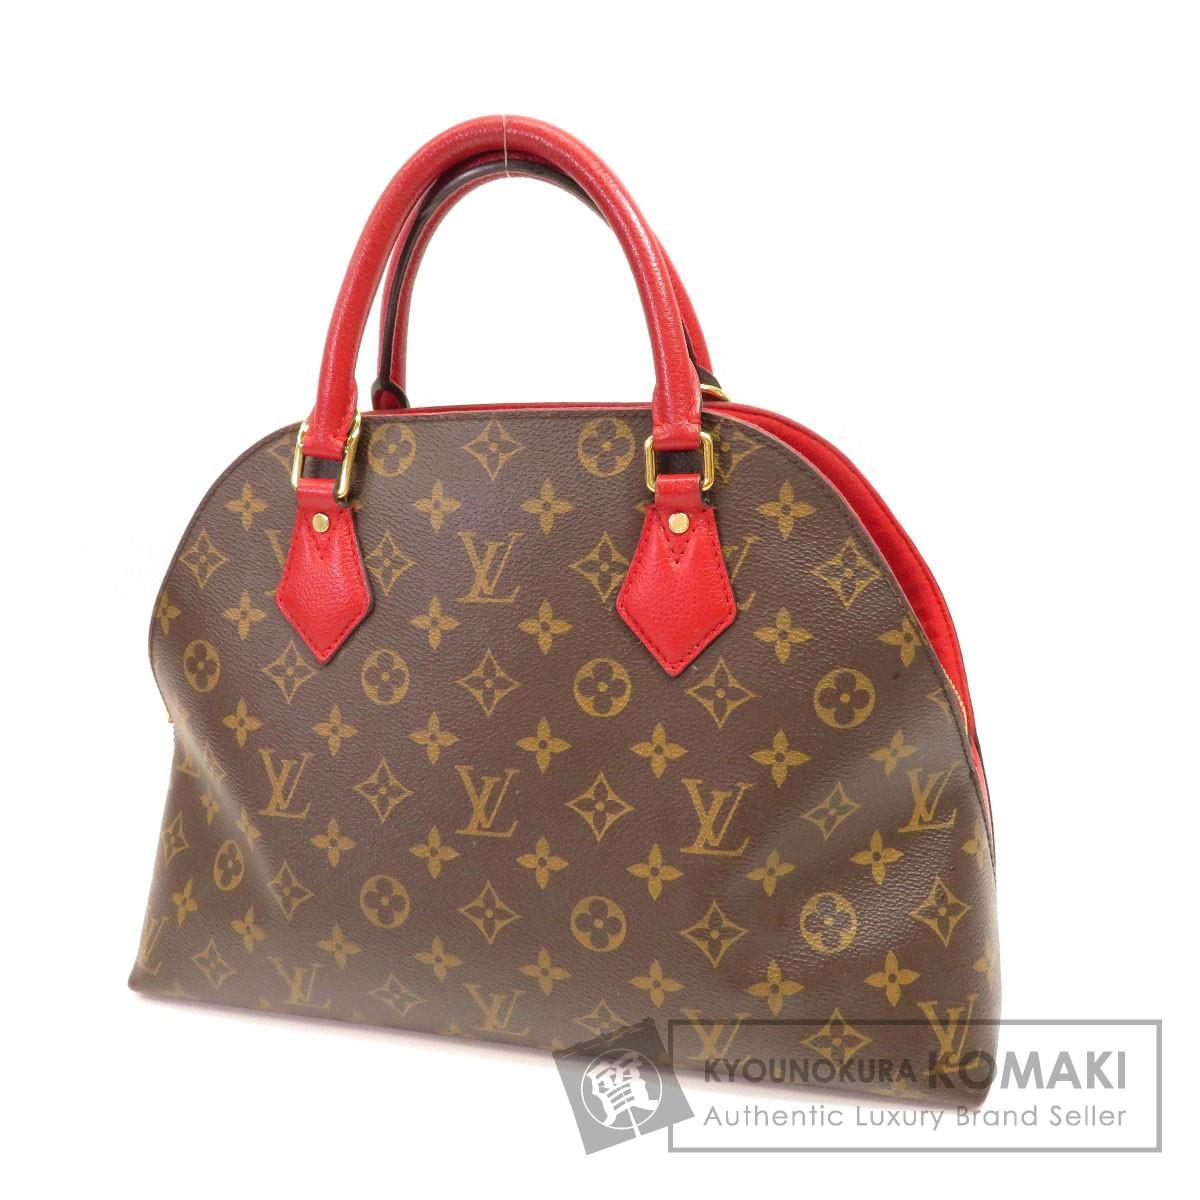 8387c6df00f3 Authentic LOUIS VUITTON M41779 Alma Bag Into - Bag Handbag Monogram canvas